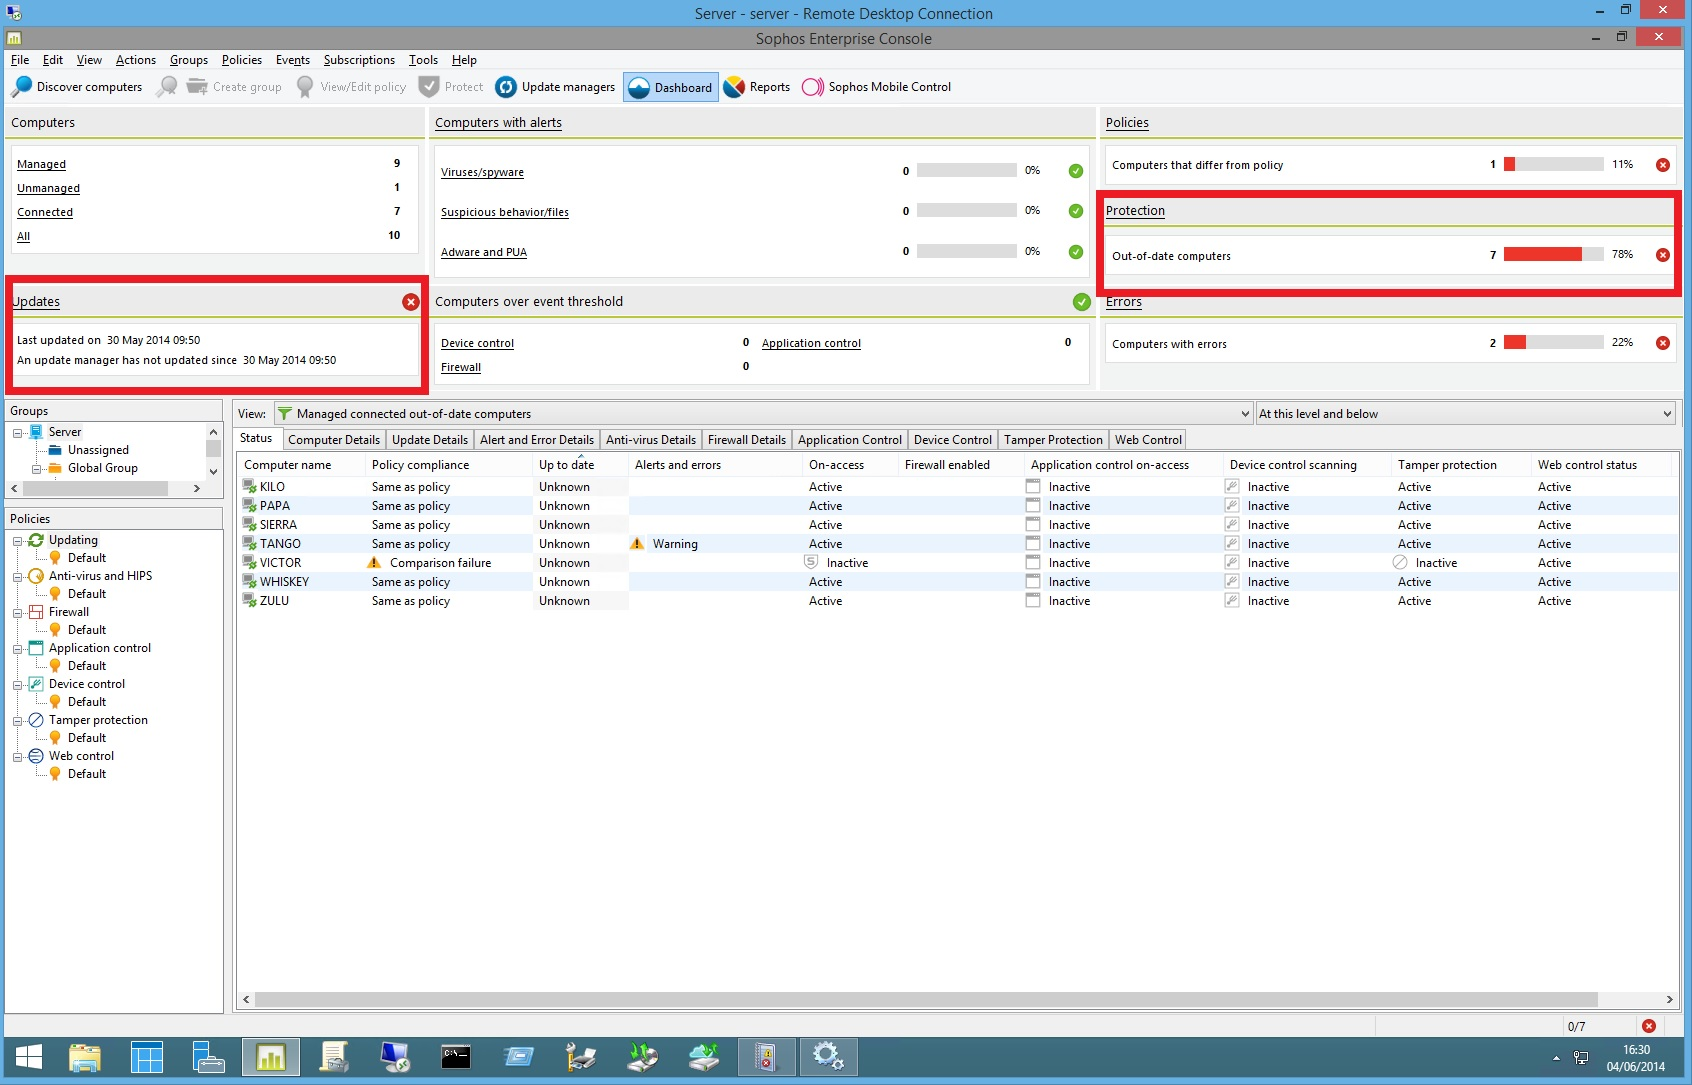 Sophos enterprise console update manager not updating askmen online dating